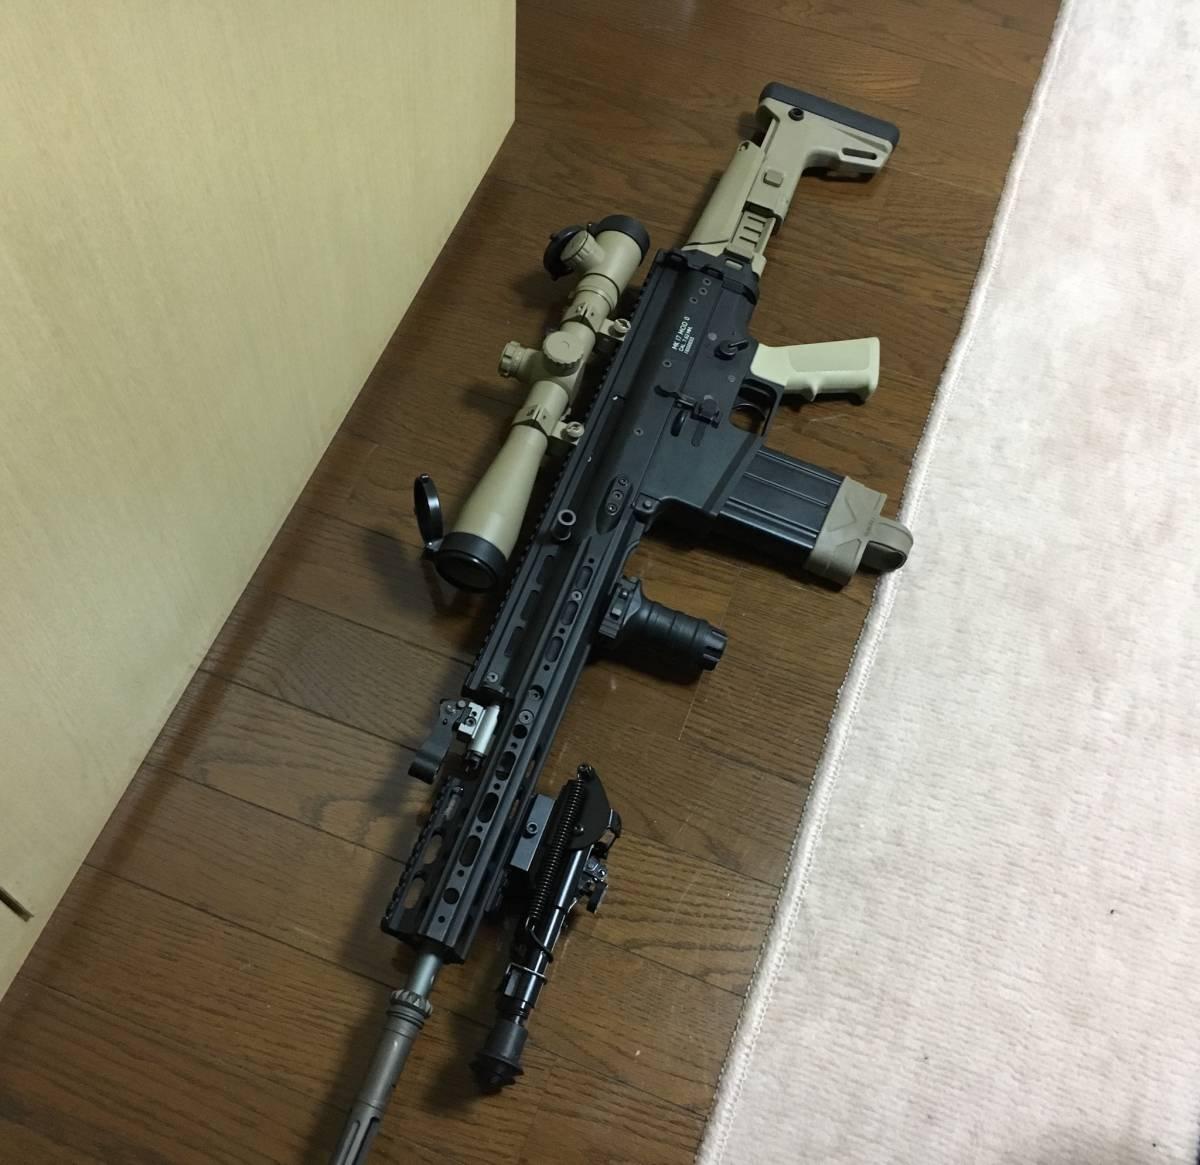 WE SCAR H スナイパーライフル フルカスタム 豪華付属品多数 M14 M4 MK17 SCAR L スカー_画像4